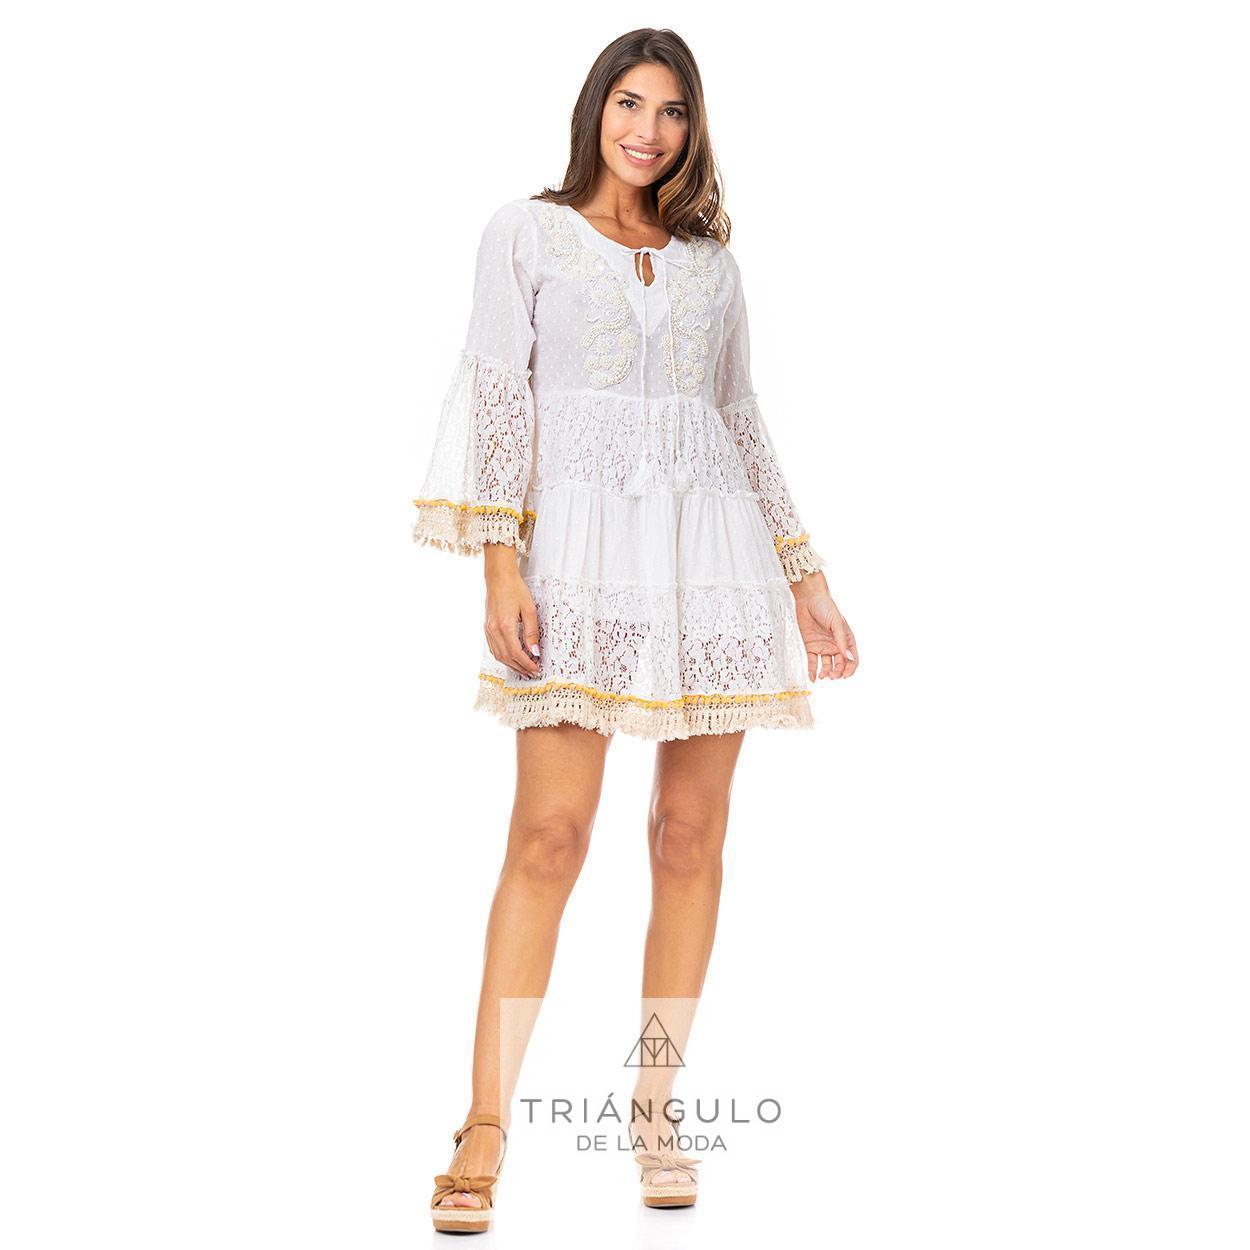 Tienda online del Triangulo de la Moda VESTIDO CORTO BOHO PLUMETI M/MADROÑOS